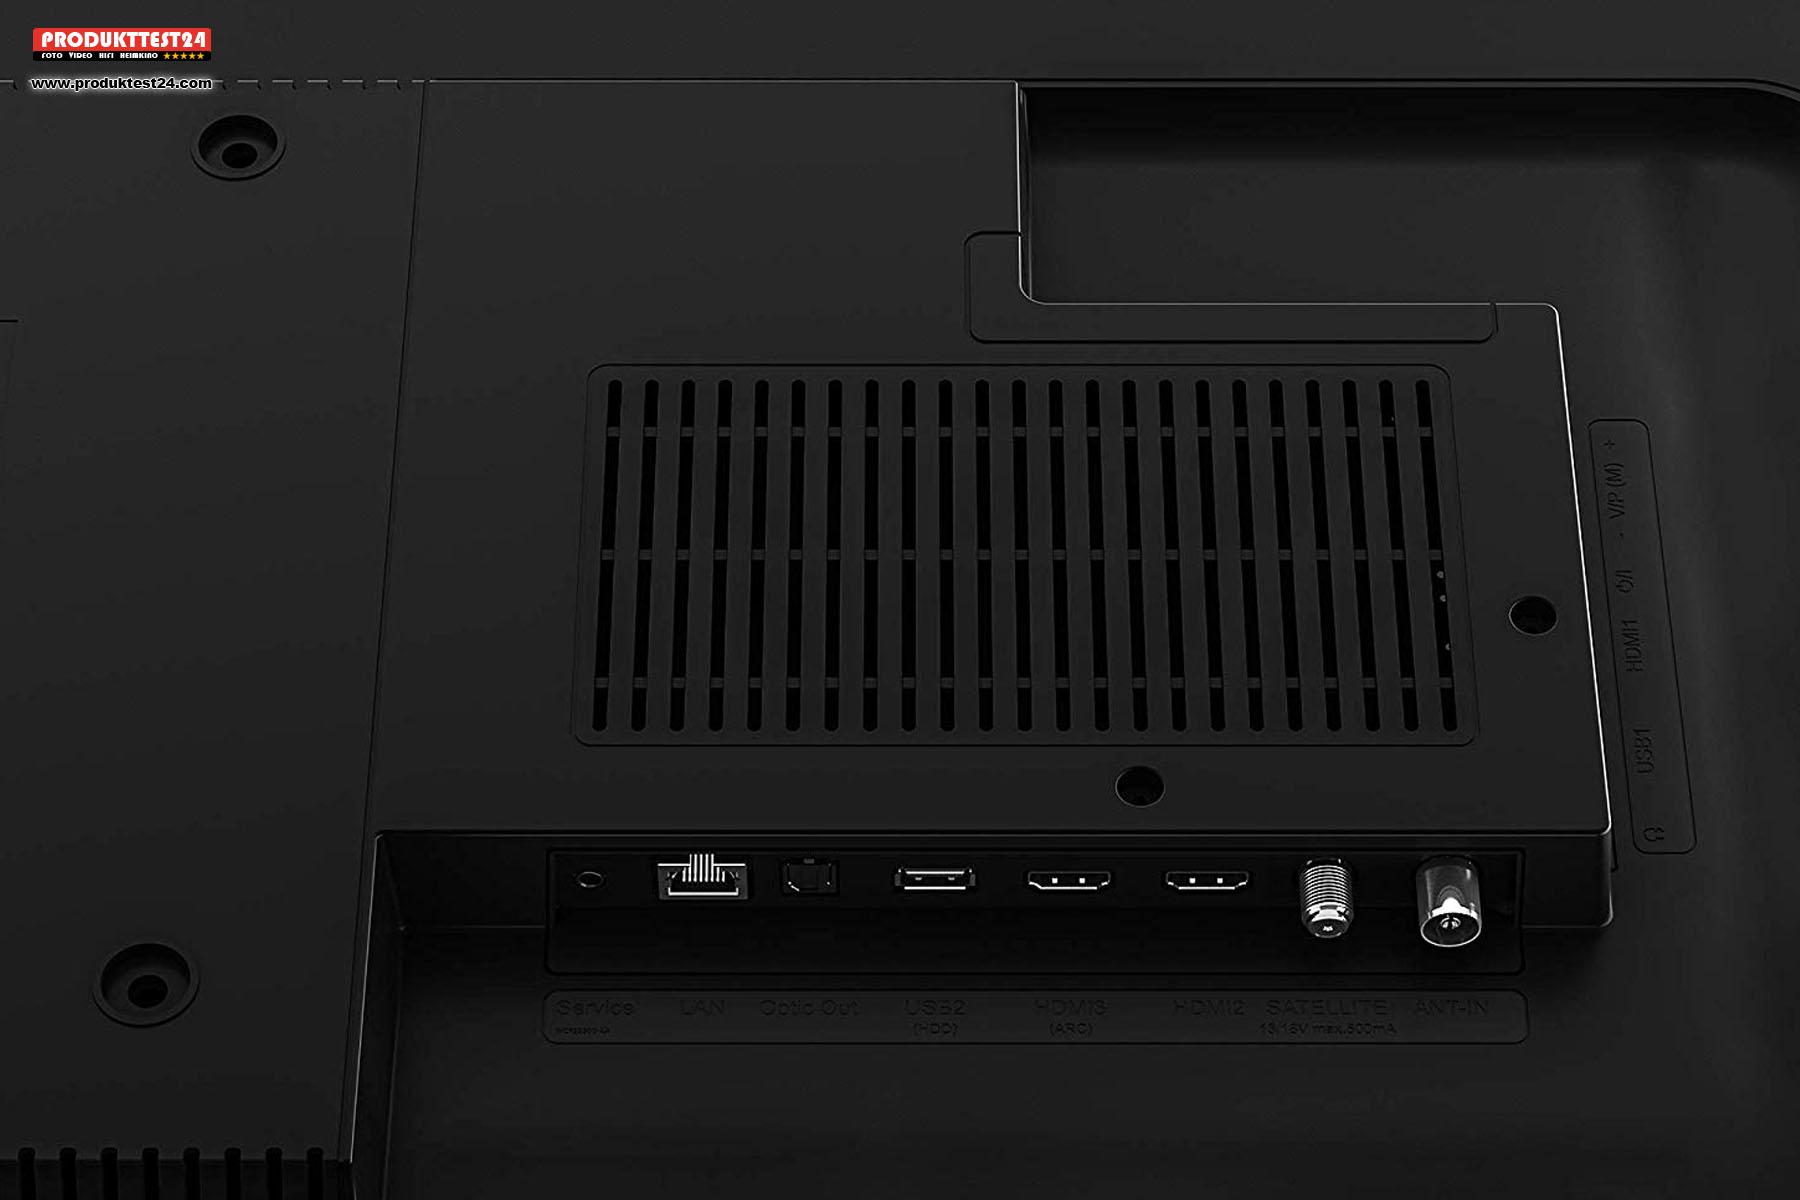 Anschlüsse des Grundig 65 VLO 8589 Fire TV Edition